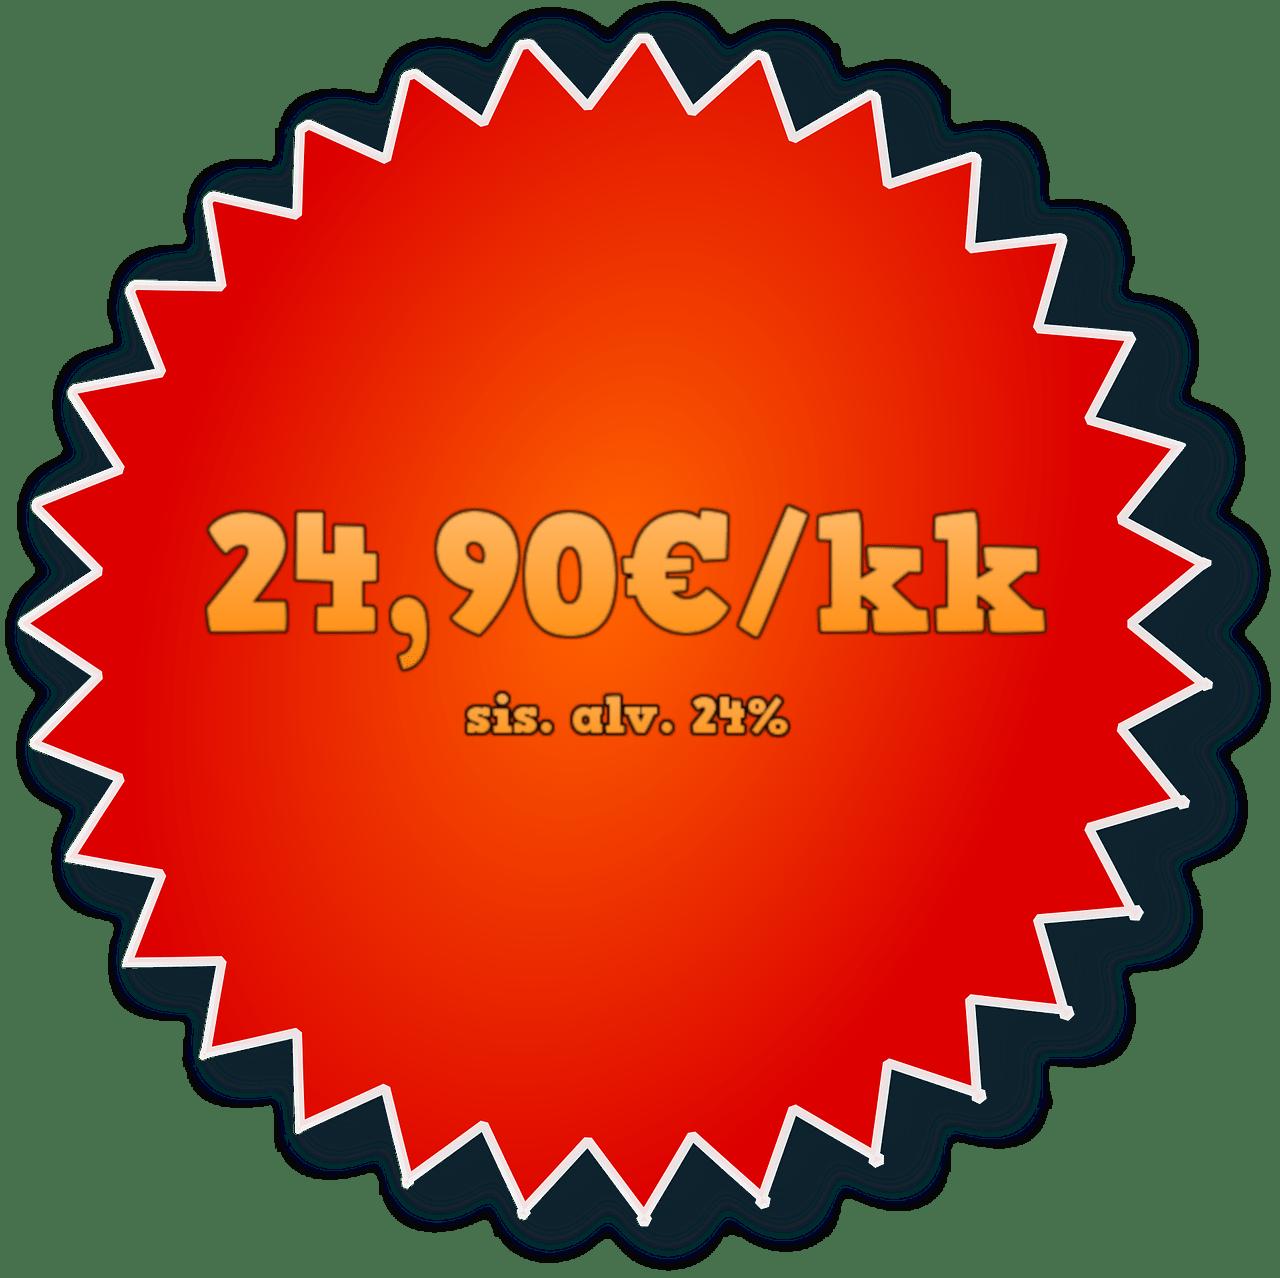 kk-hinta